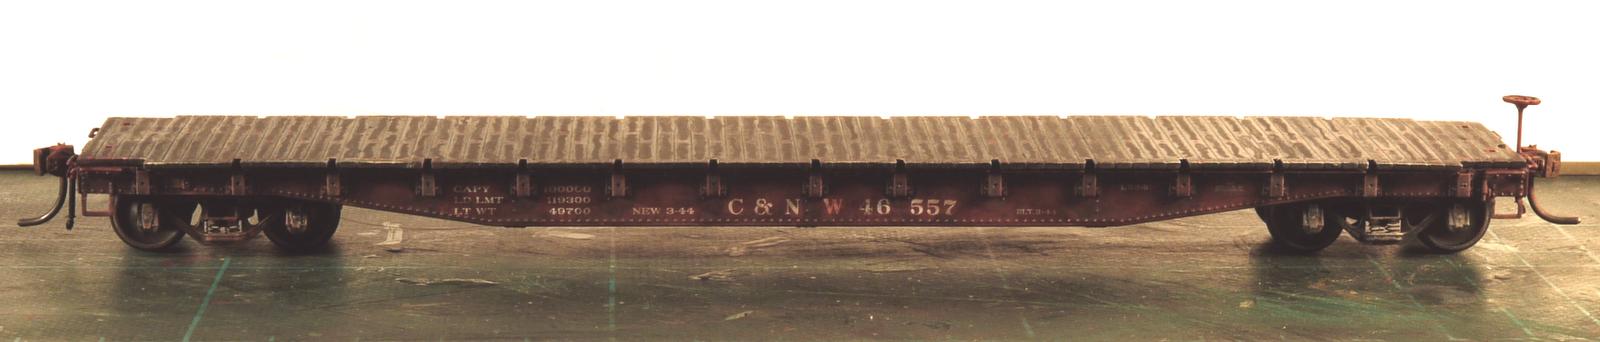 C&NW+46557+flat+car+8.png